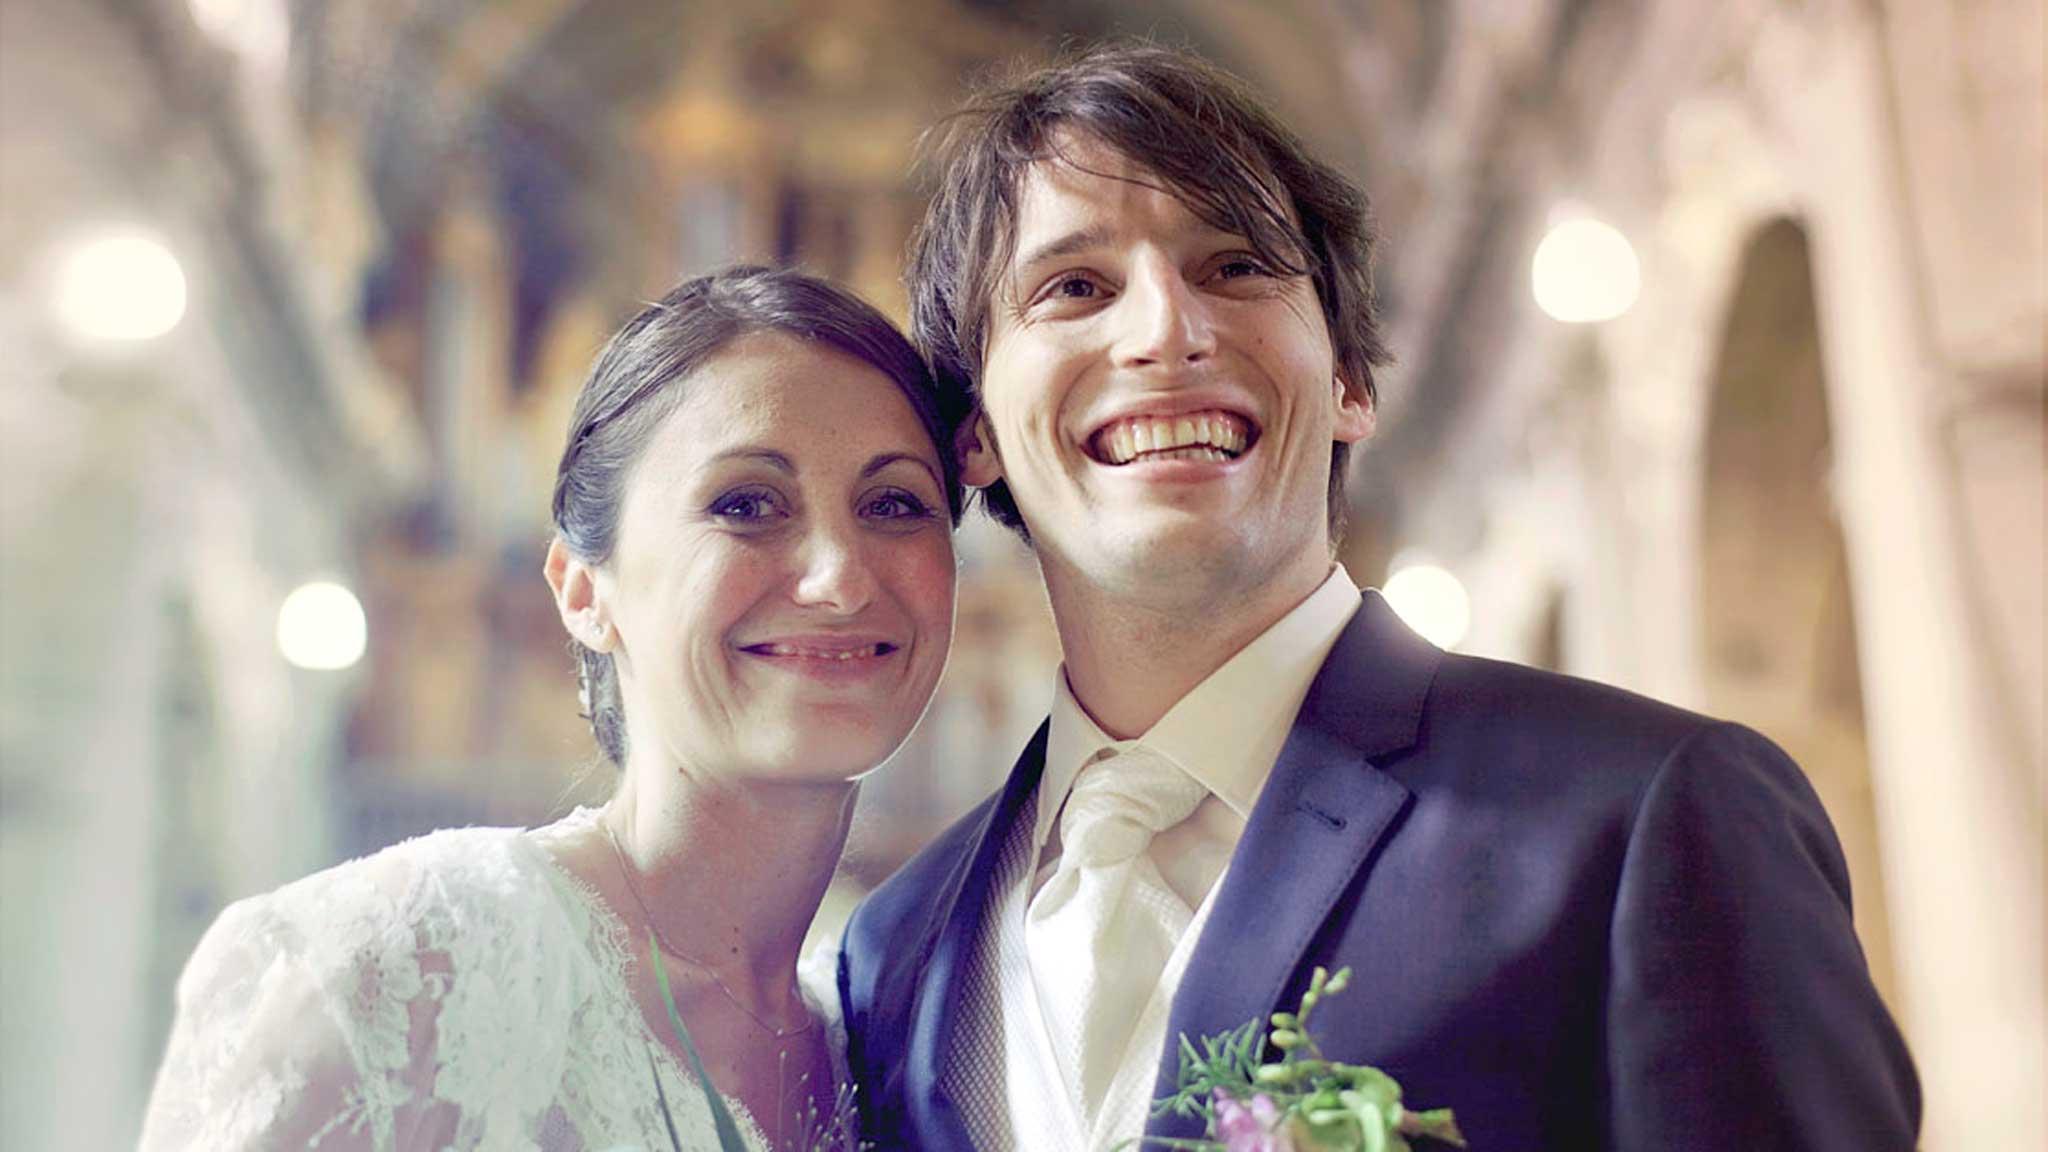 portrait-couple-church-eglise-photographe-mariage-wedding-photographer